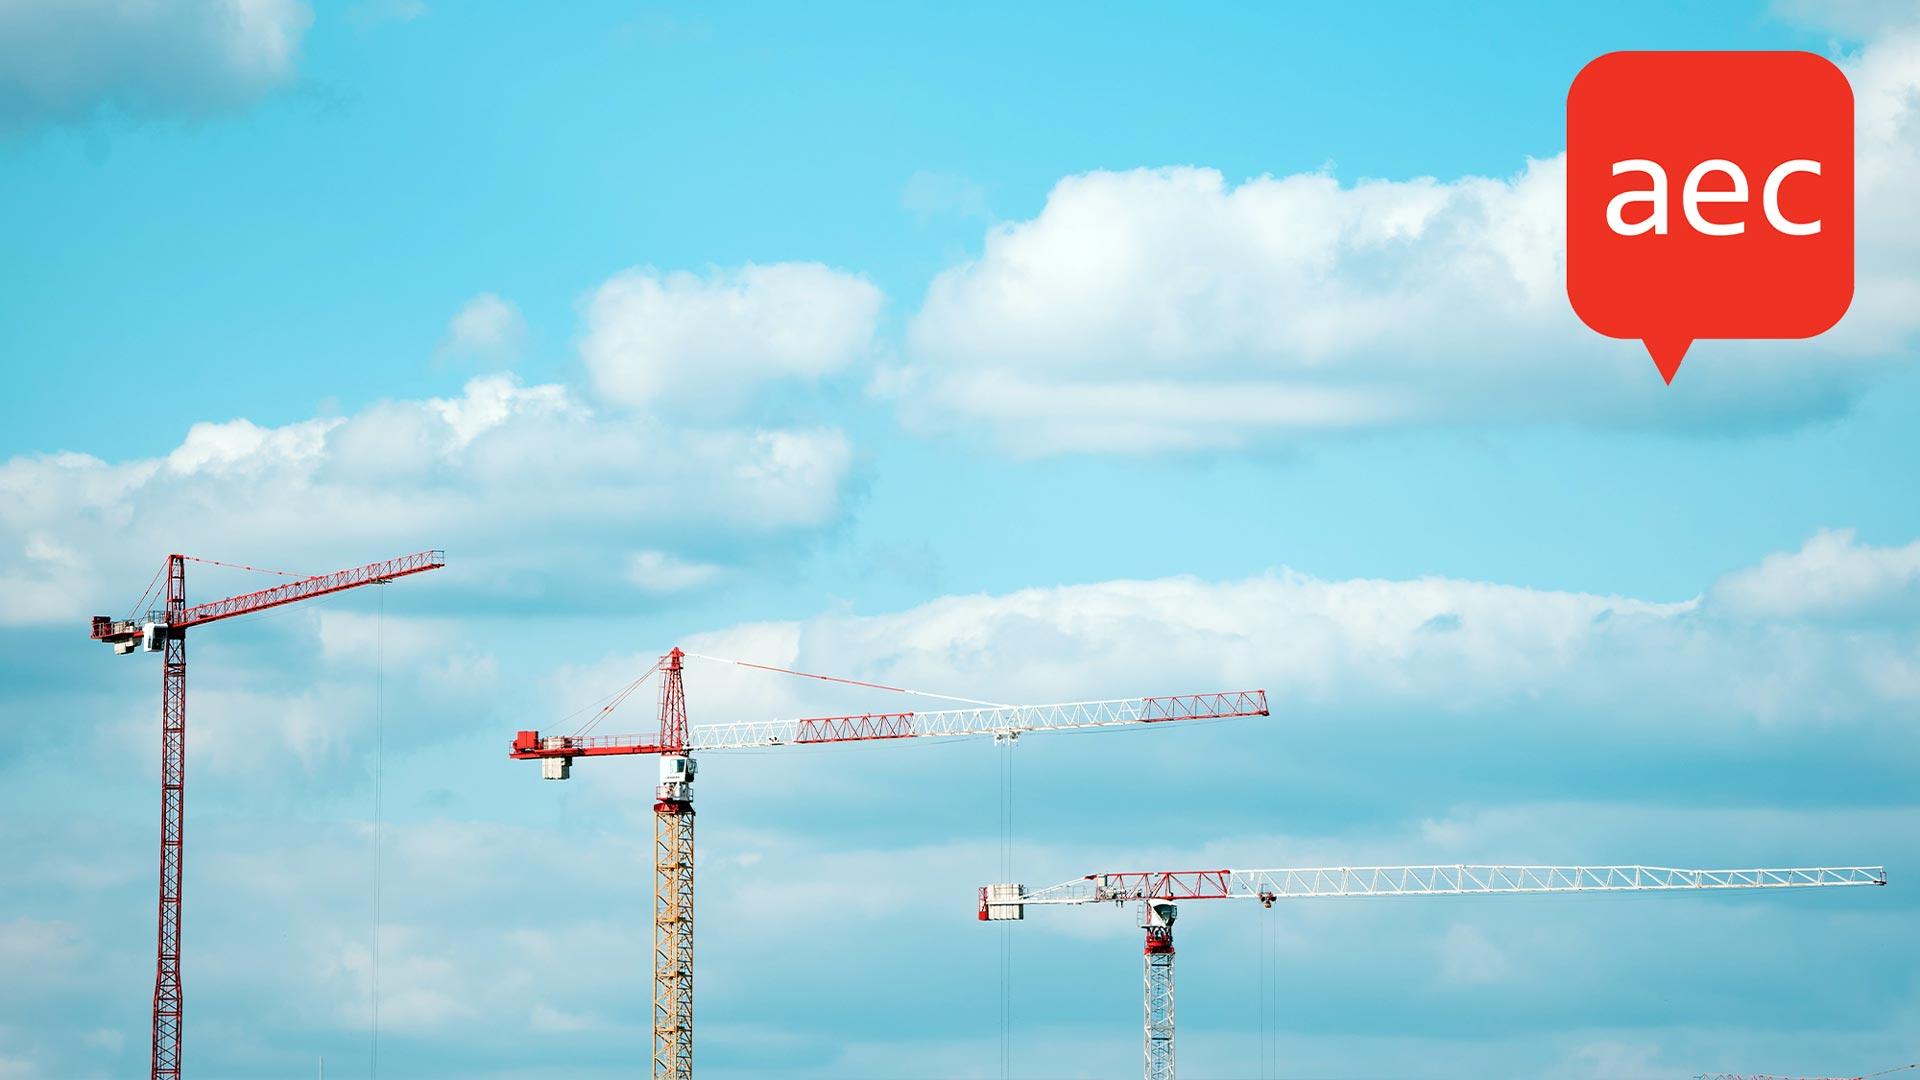 Construction interoperability